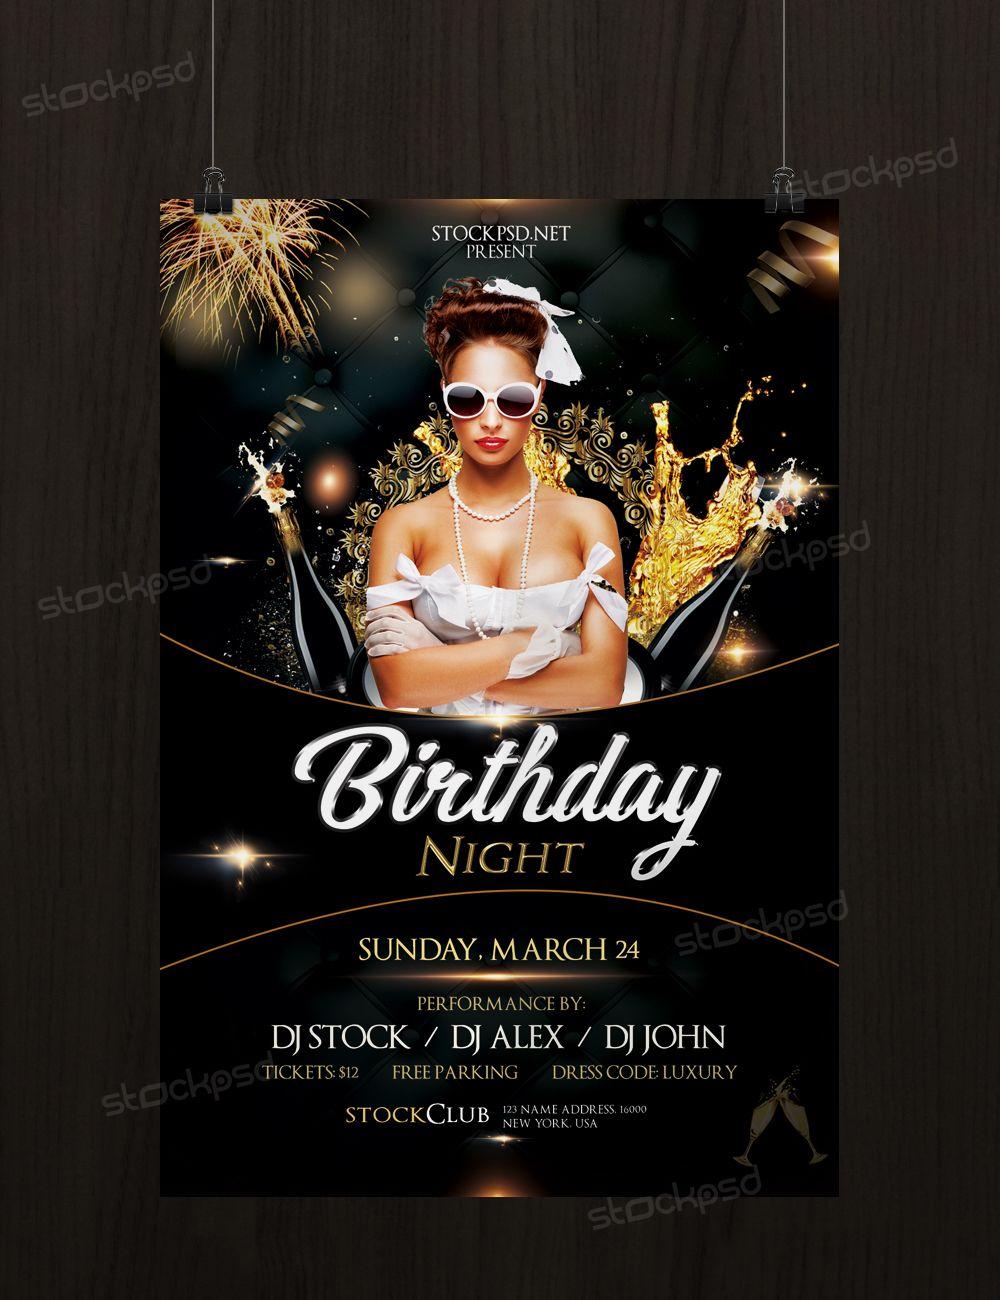 Birthday Gold Night Free Luxury Psd Flyer Template Birthday Flyer Free Psd Flyer Templates Free Psd Flyer